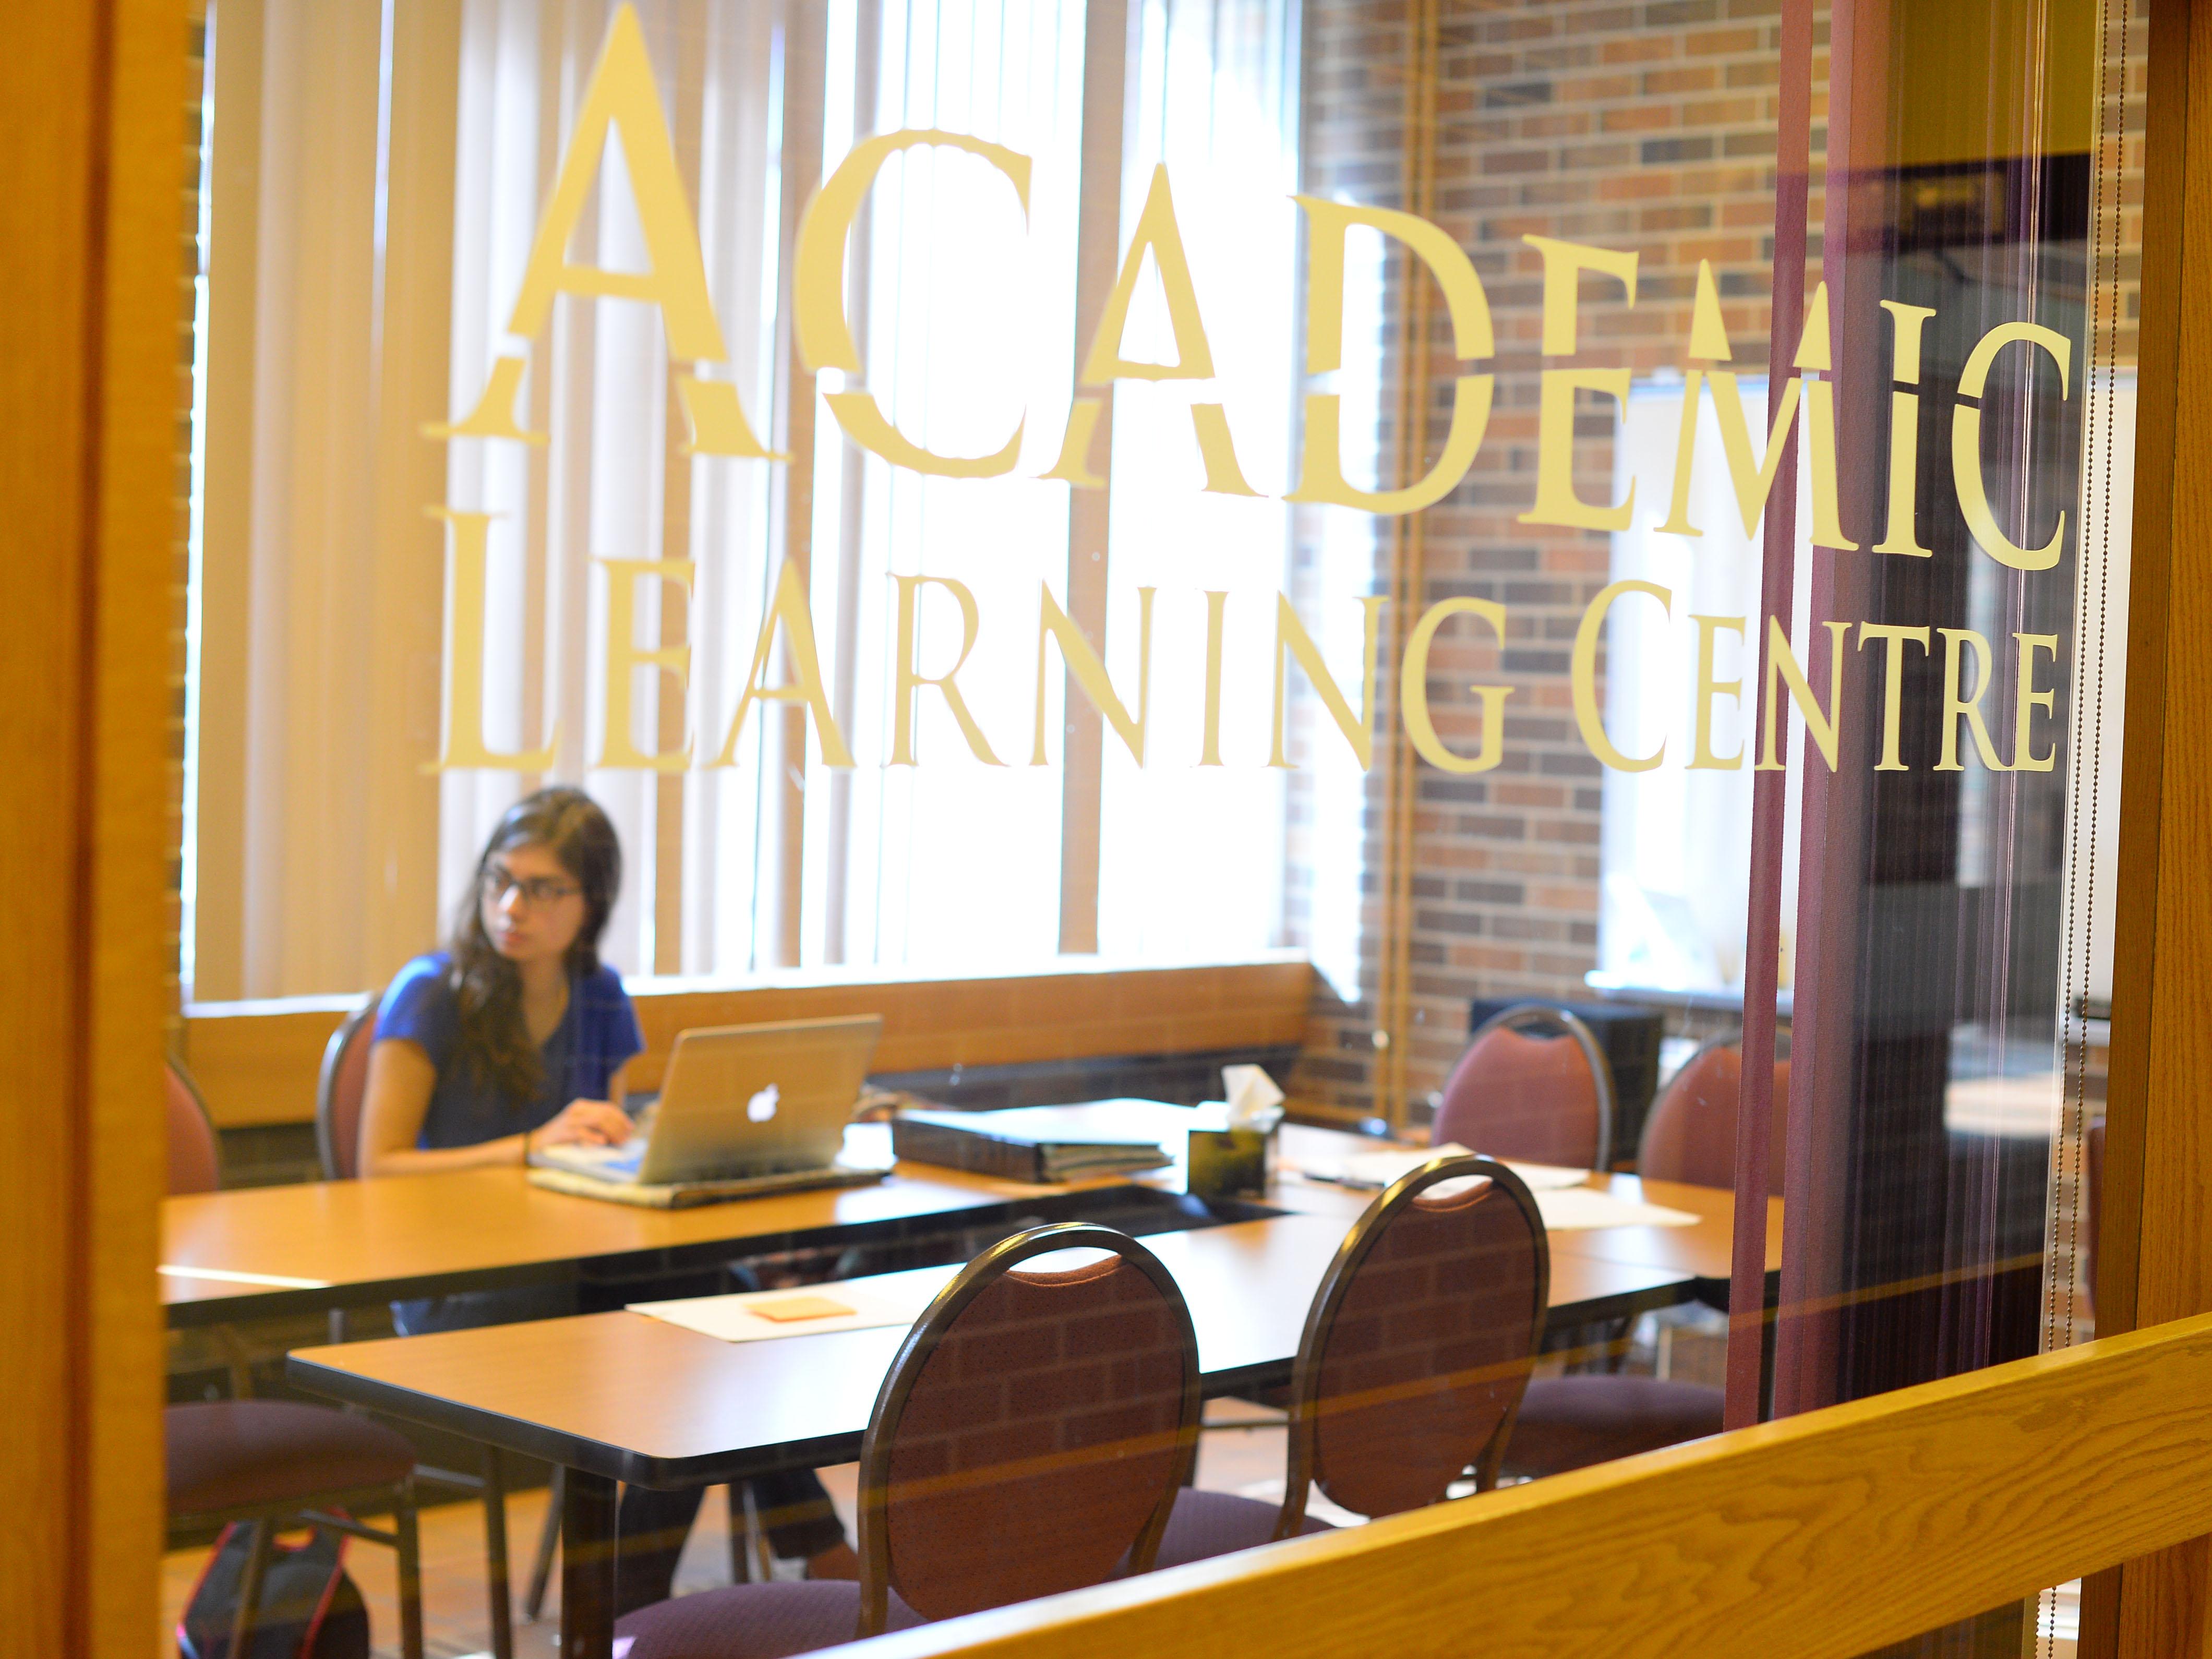 AcademicLrngCentre